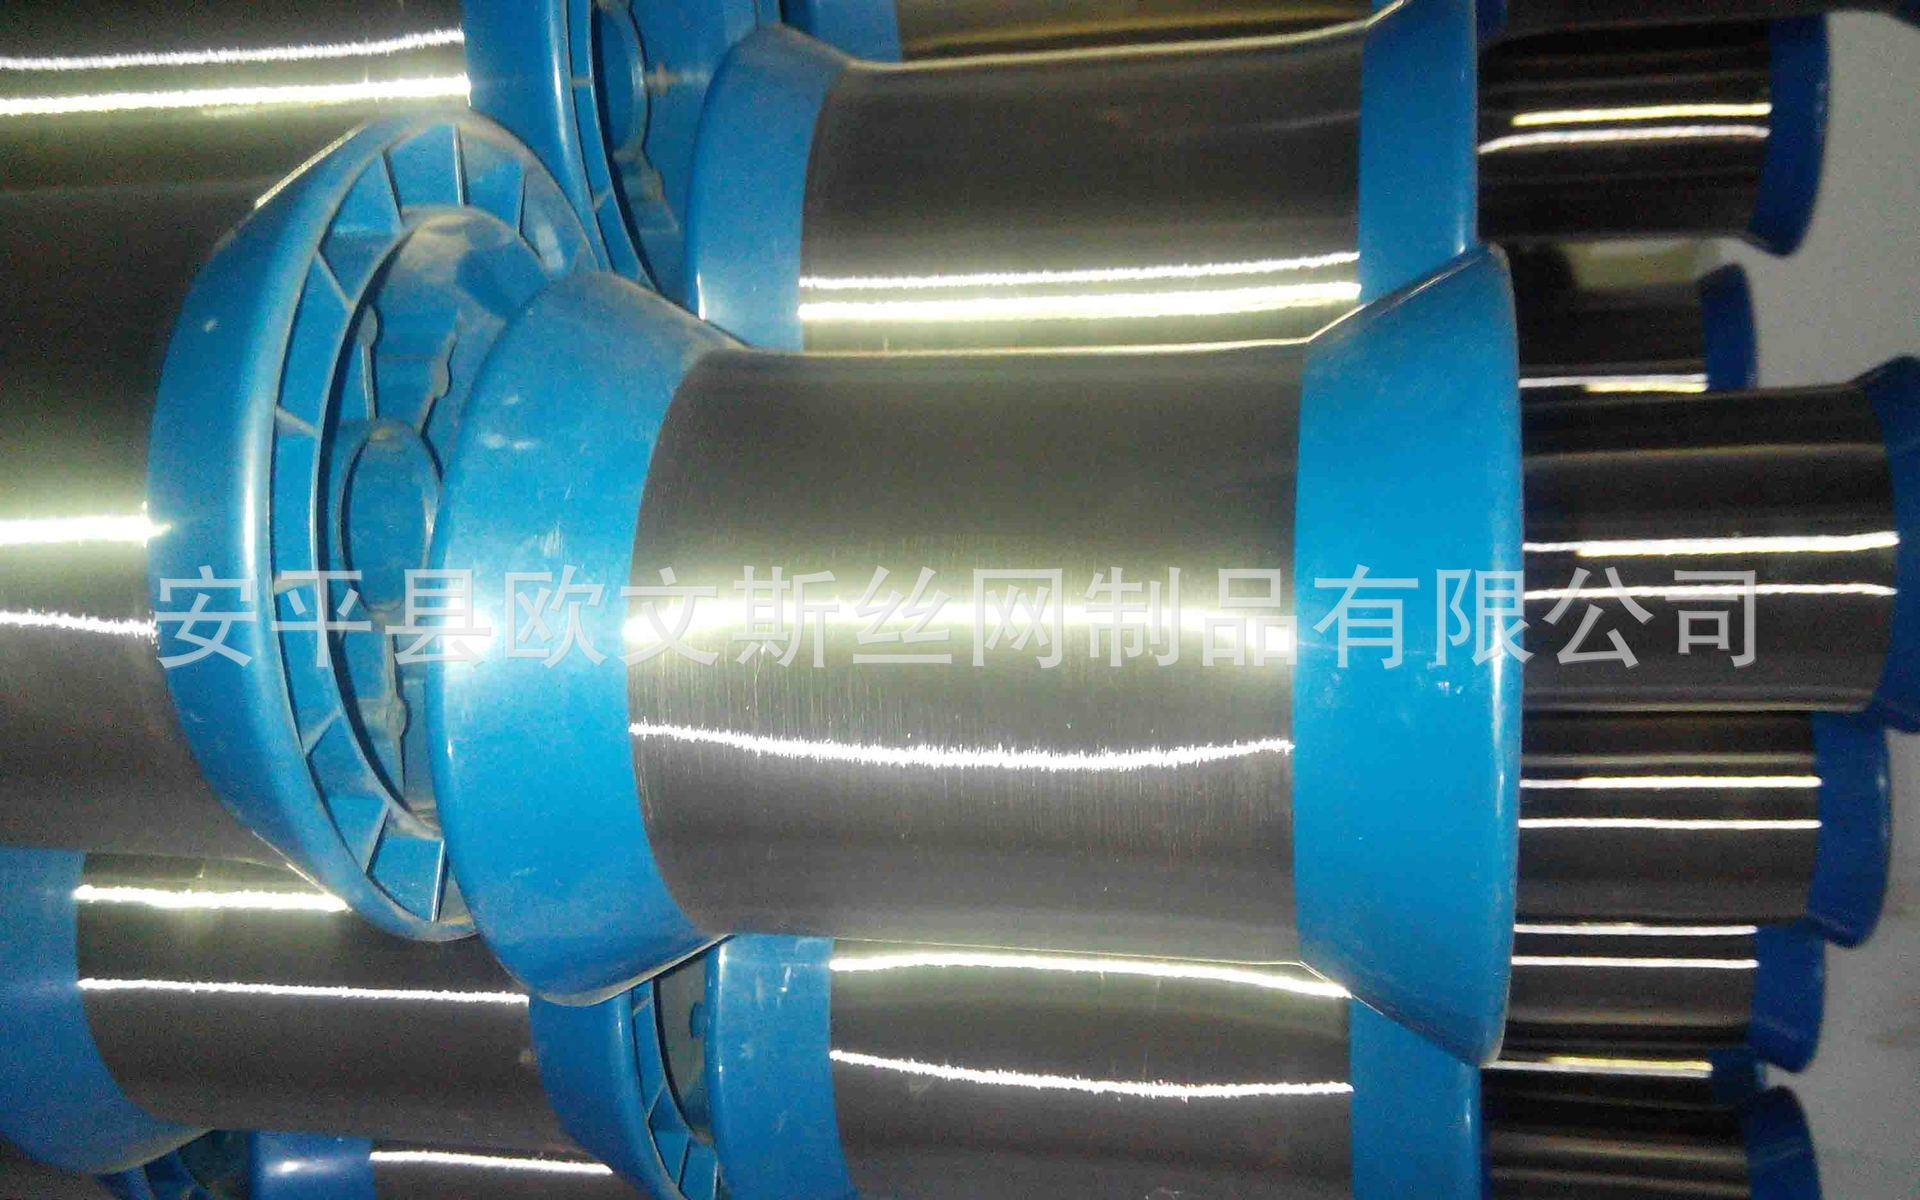 NLSX inox   Supply of high-purity raw materials N6 Jinchuan nickel wire 0.0018-0.05mm